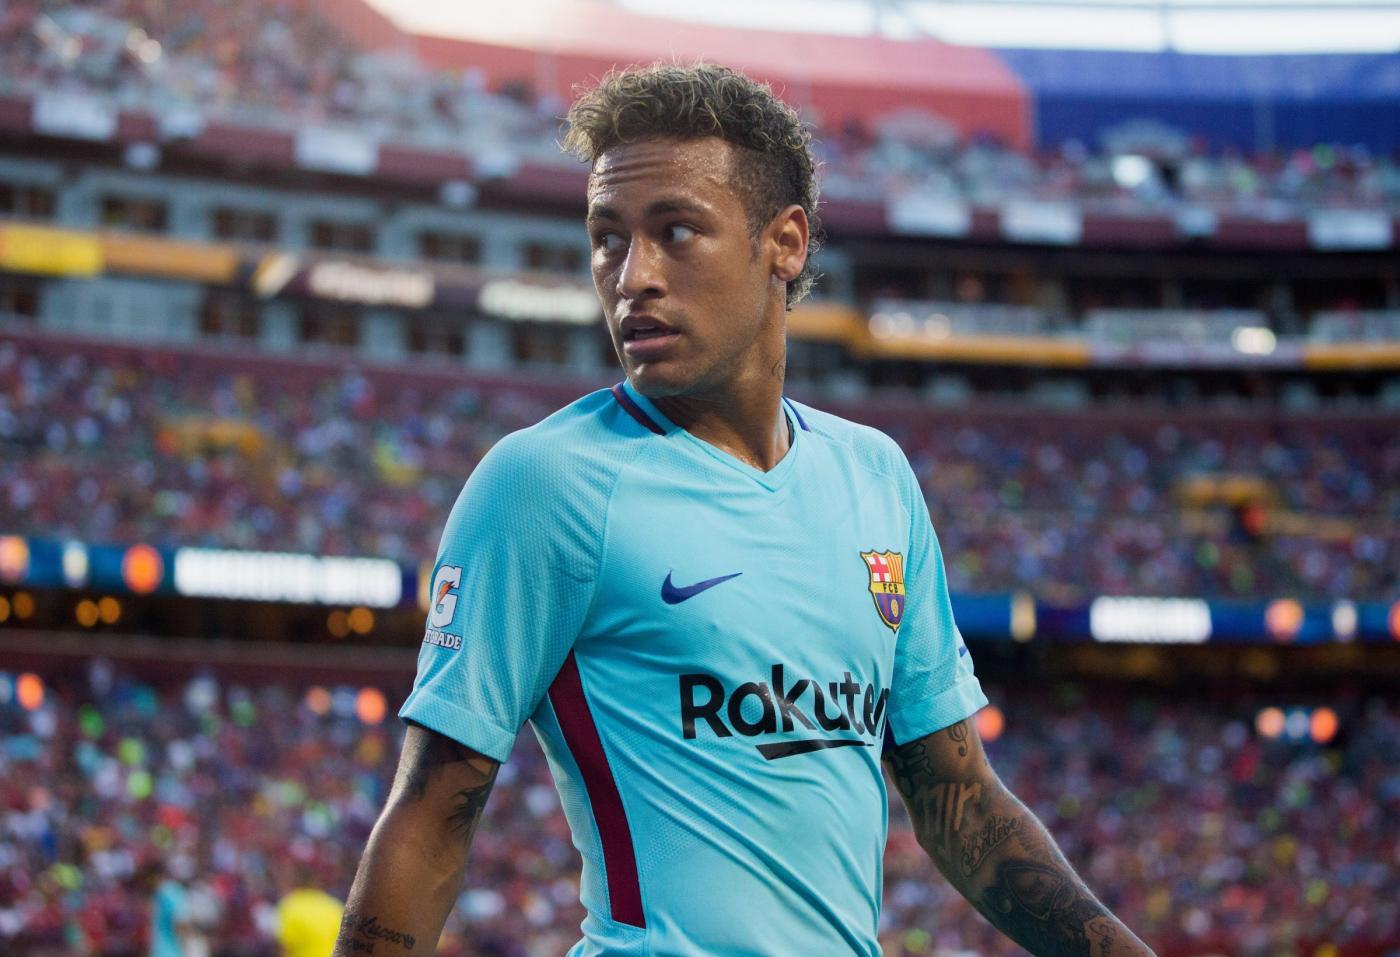 Calciomercato Juventus: dalla Spagna se parte Neymar si punta su Dybala